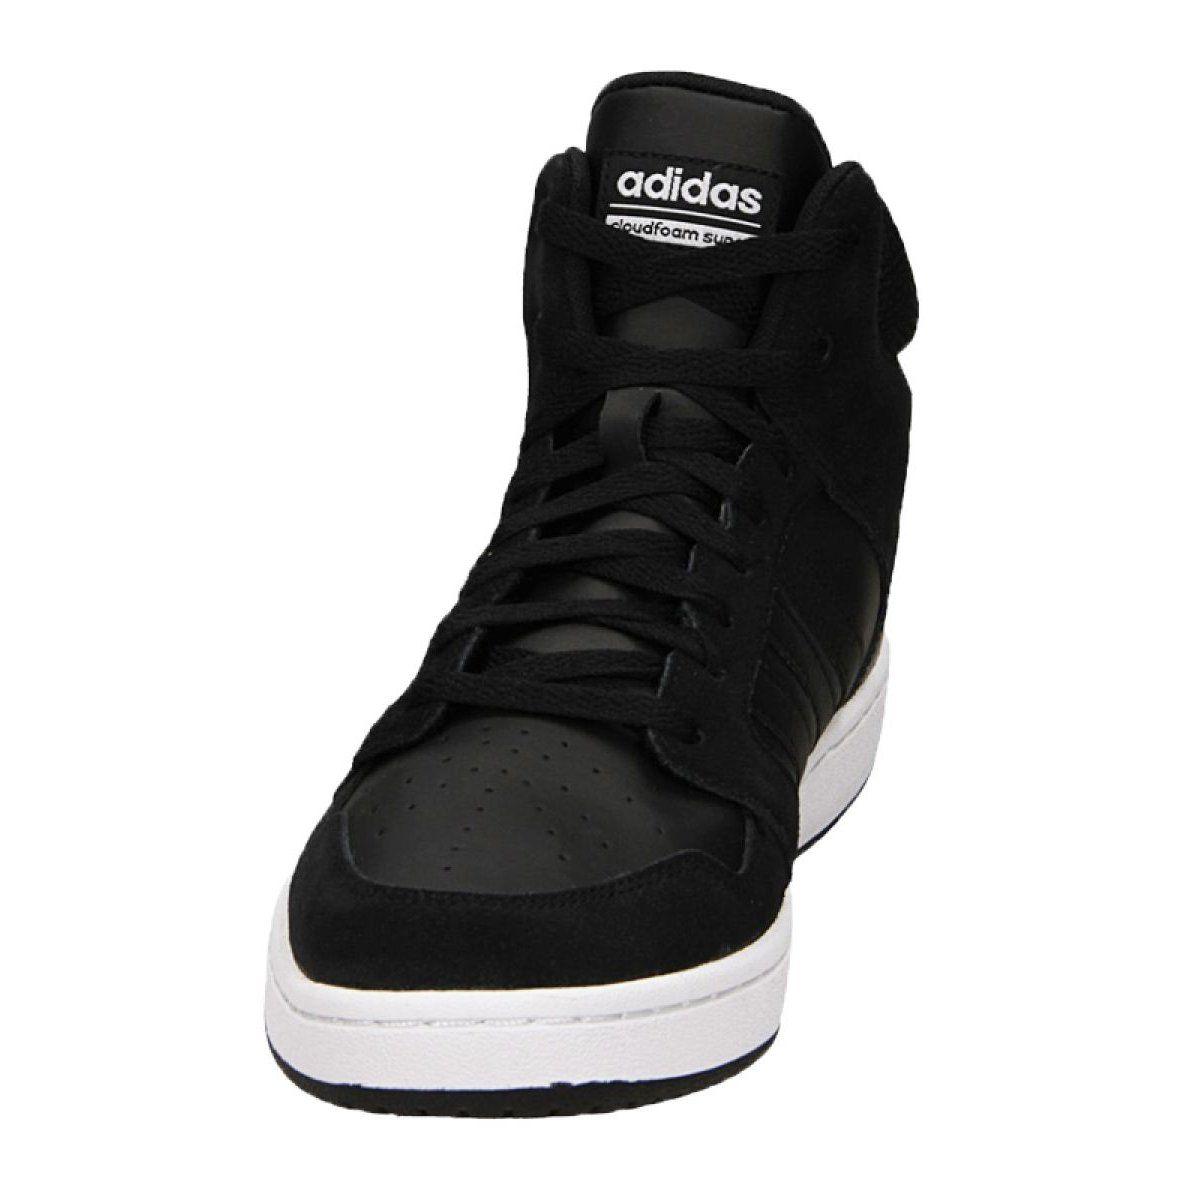 Adidas Cloudfoam Super Hoops Mid M Bb9920 Shoes Black Adidas Cloudfoam Black Shoes Adidas